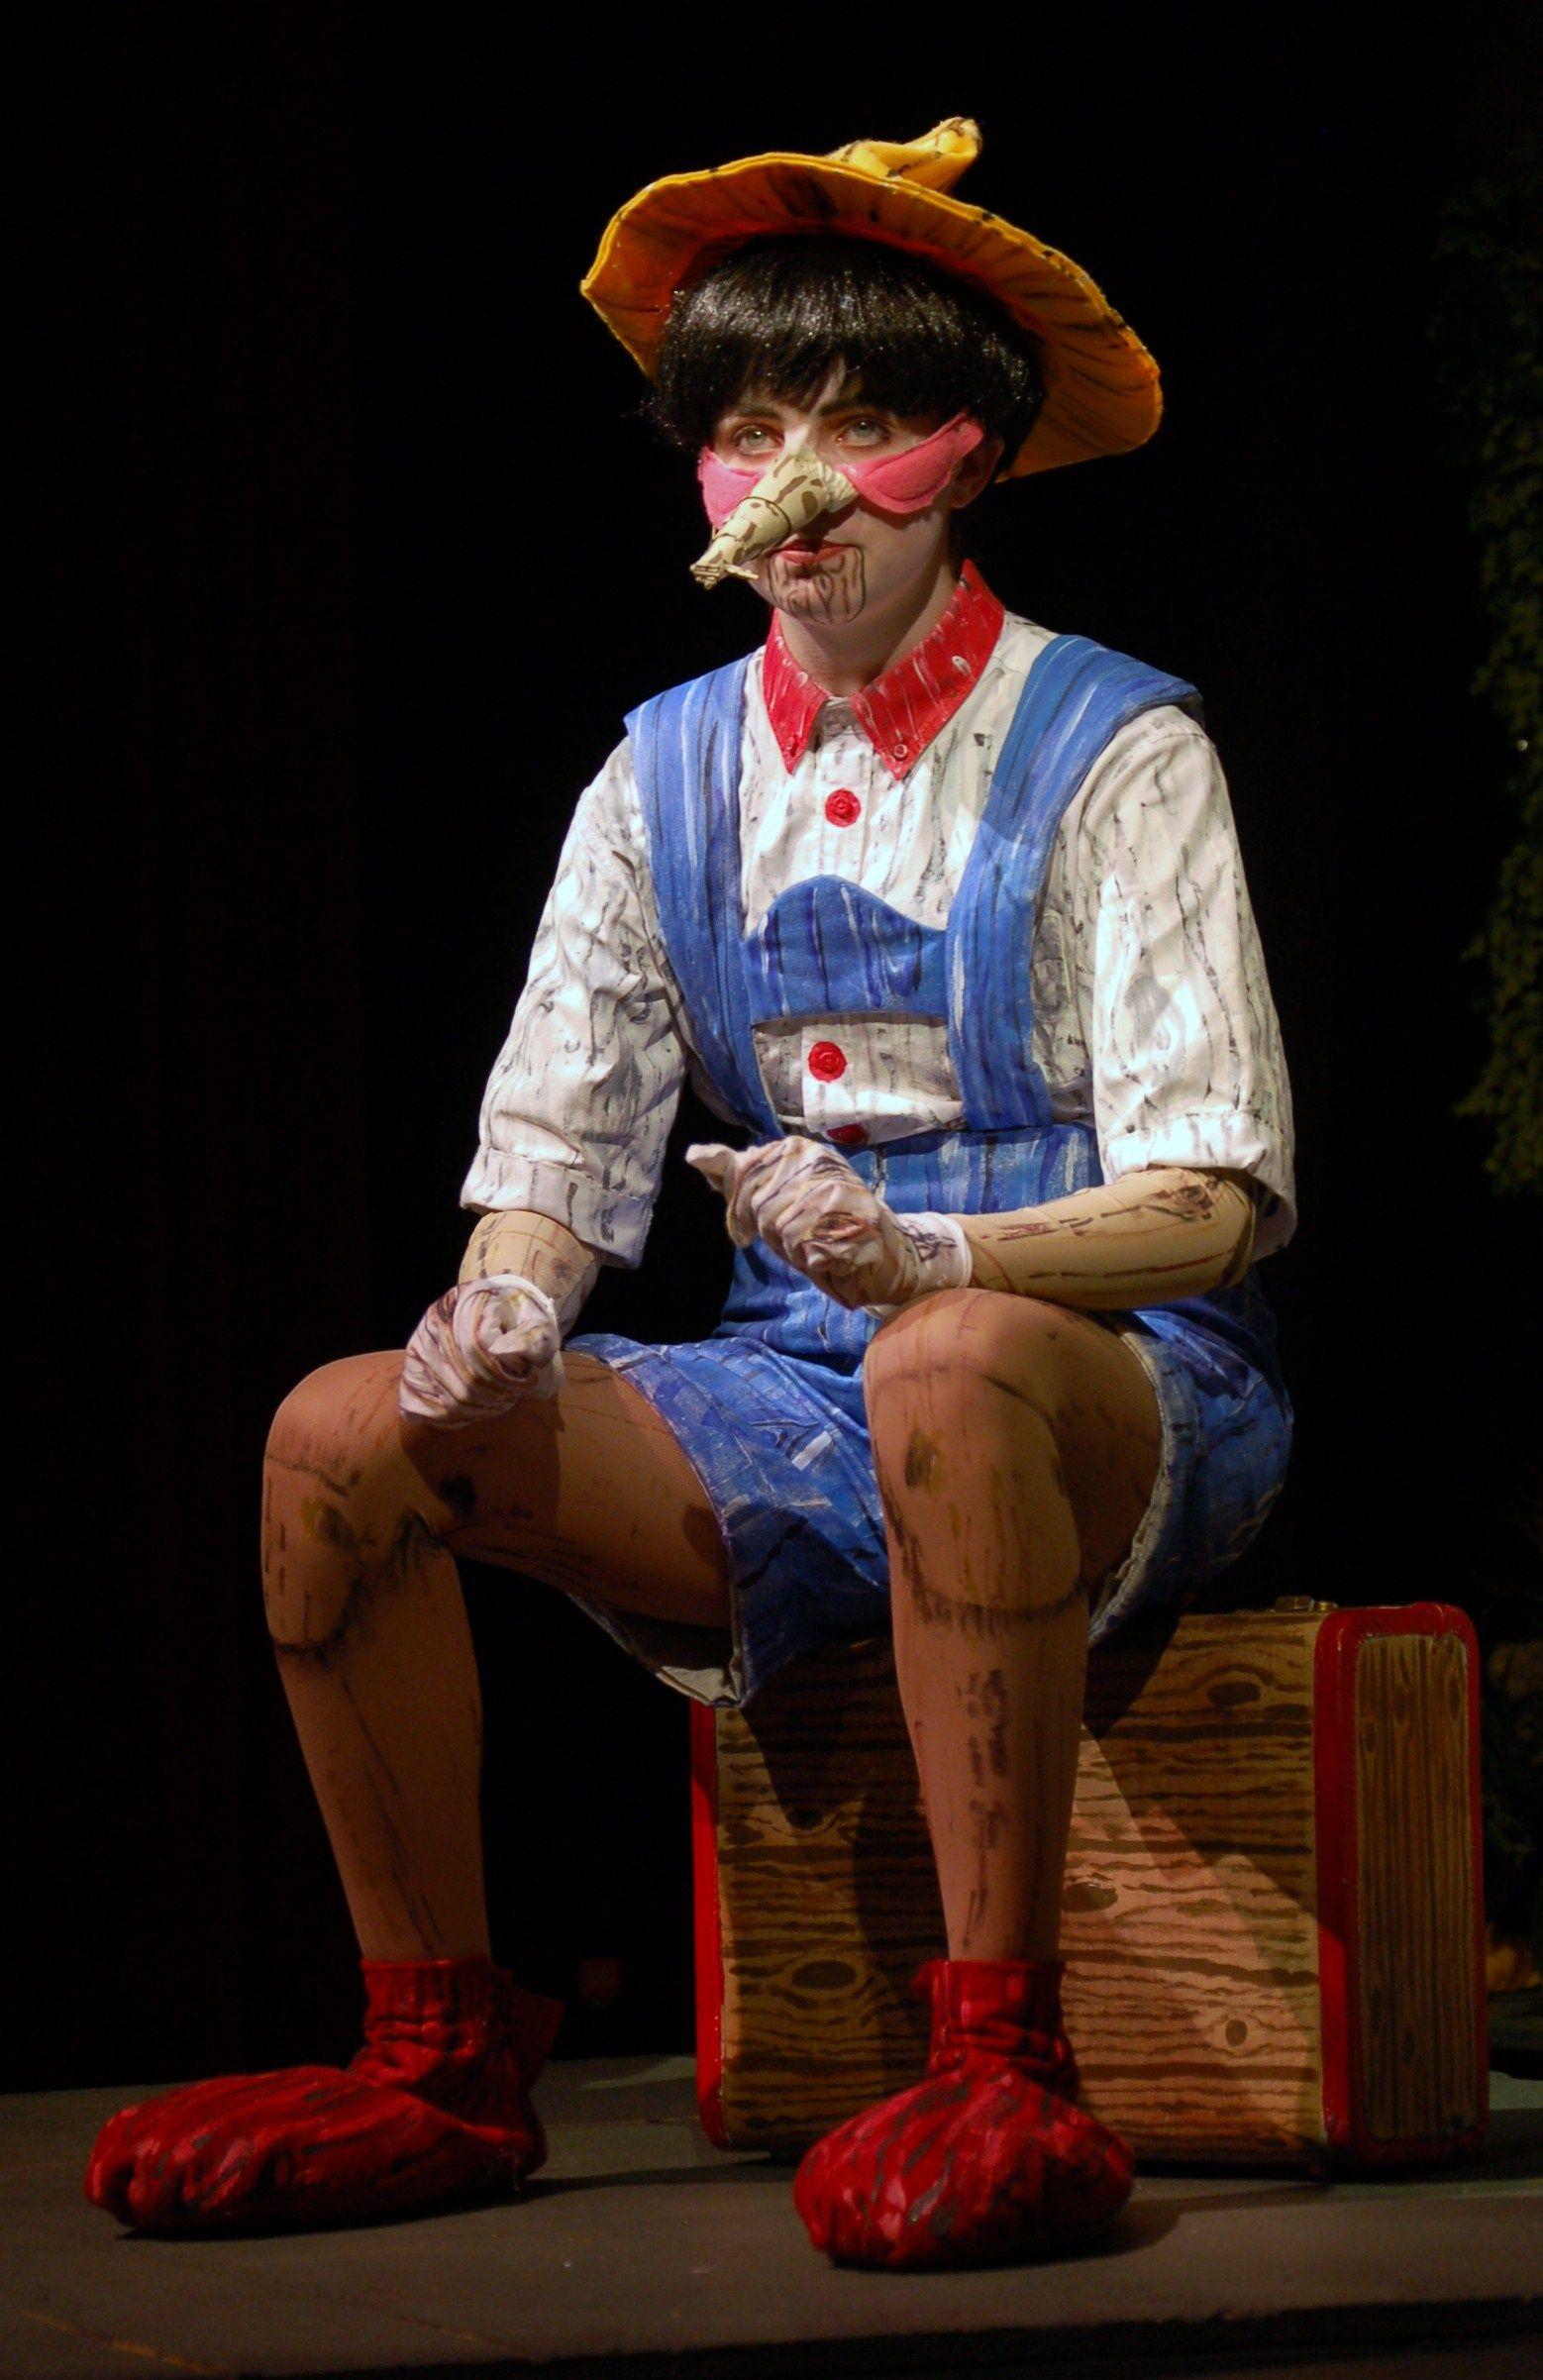 Pinocchio With Wood Suitcase Shrek Costume Pinocchio Shrek